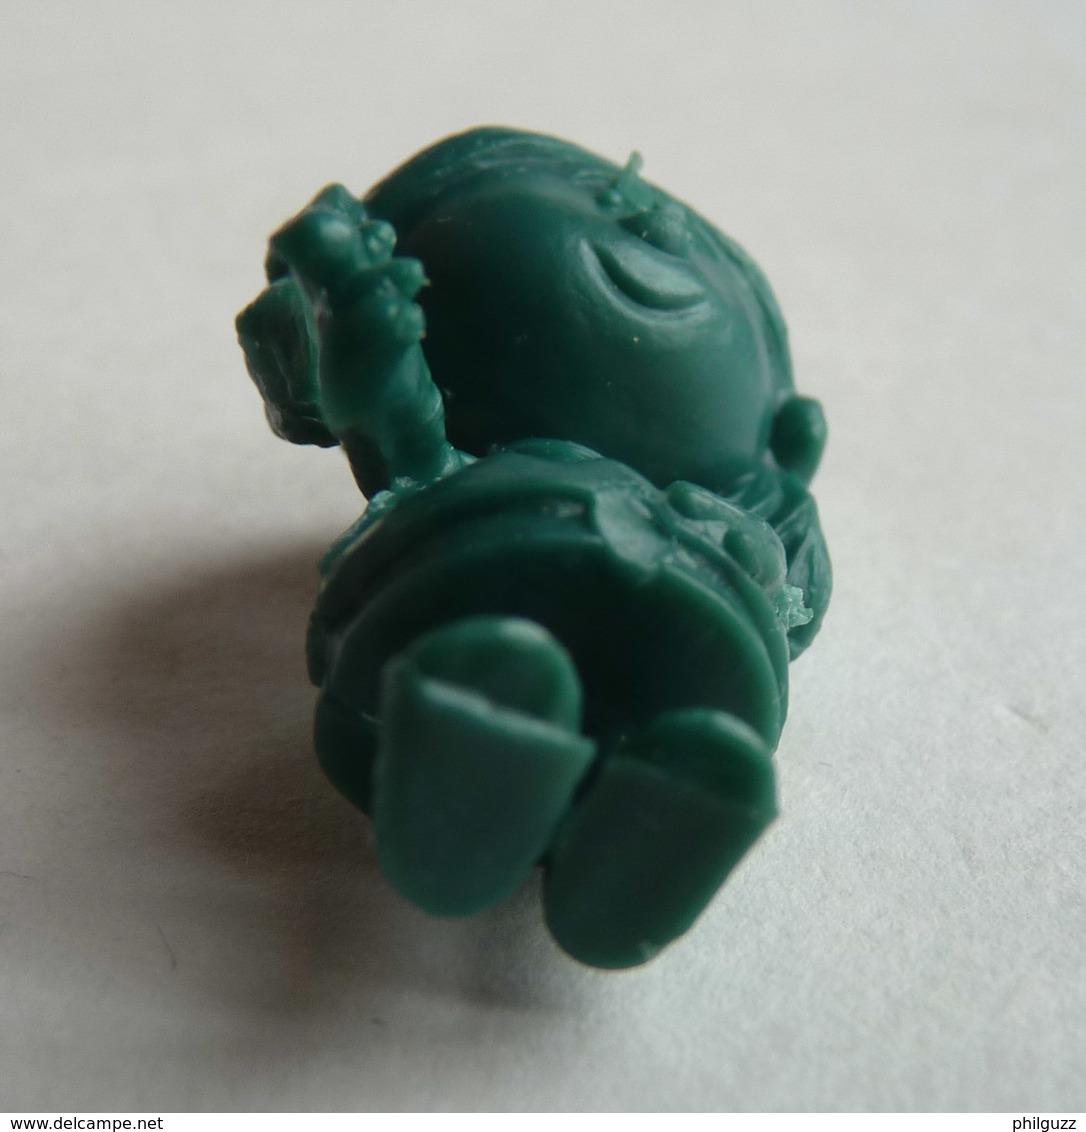 TRES RARE FIGURINE ORTF MANEGE ENCHANTE - MAGIC ROUNDABOUT - PIRATE RES PLASTIC - CORALIE VERT BOUTEILLE Pas DUNKIN - Figurines